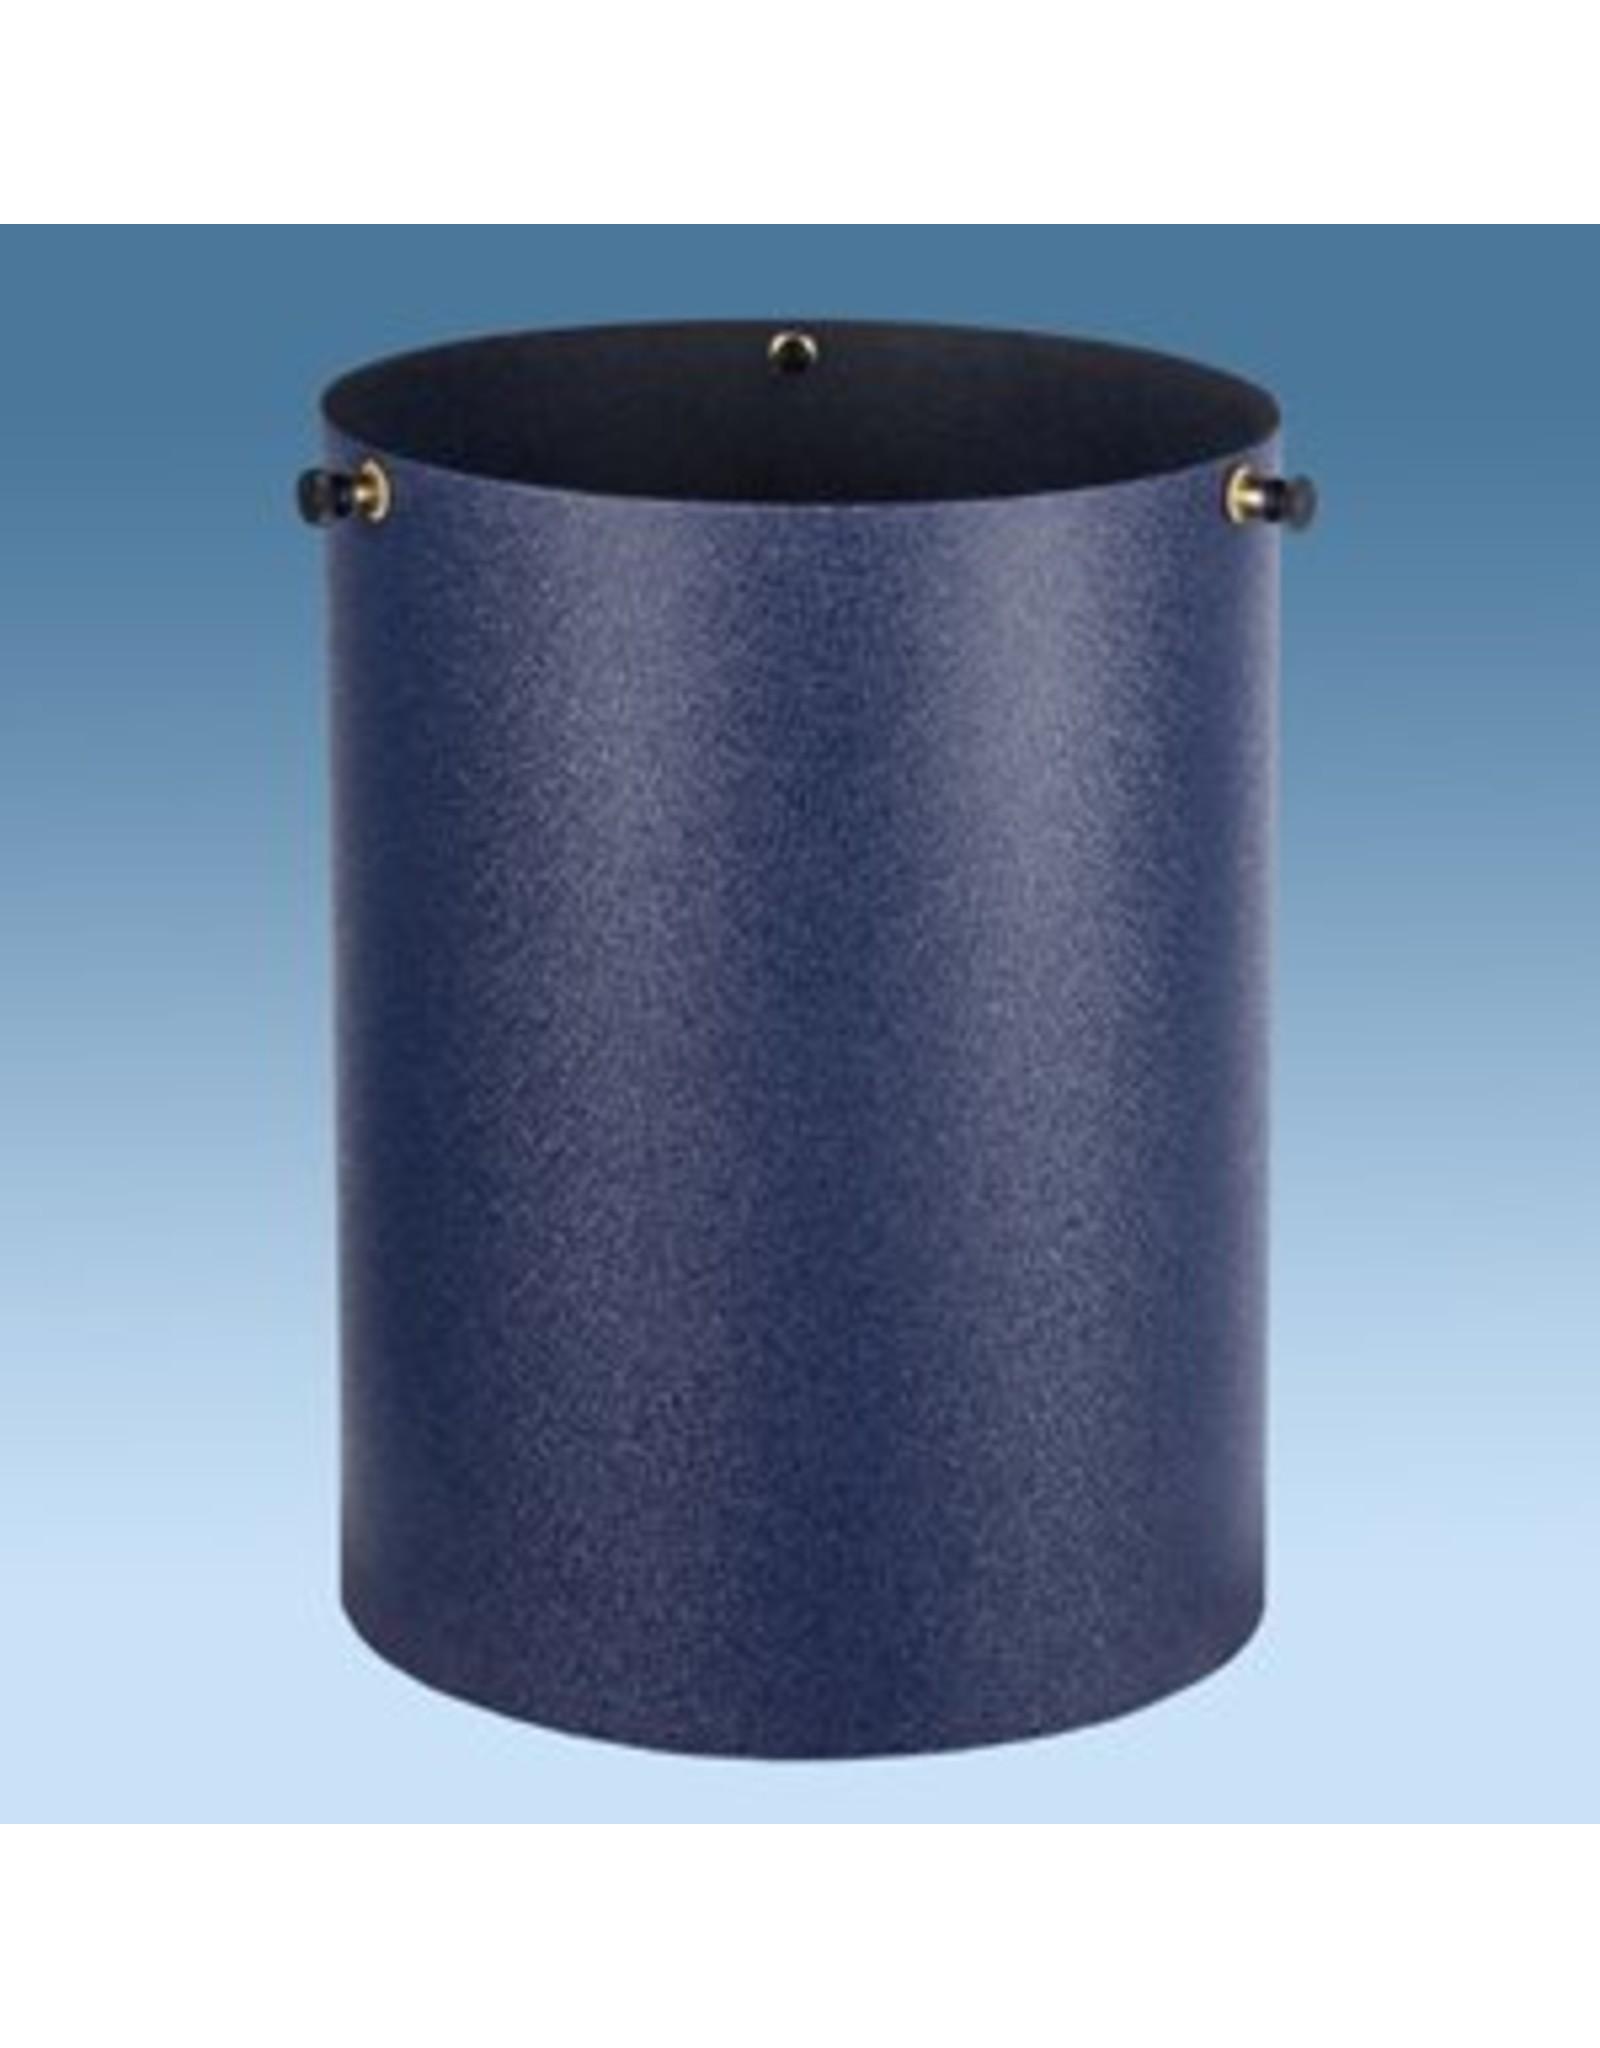 Astrozap AZ-205-T Meade 8 Sct LX90/LX200 Aluminum Dew Shield Textured Blue